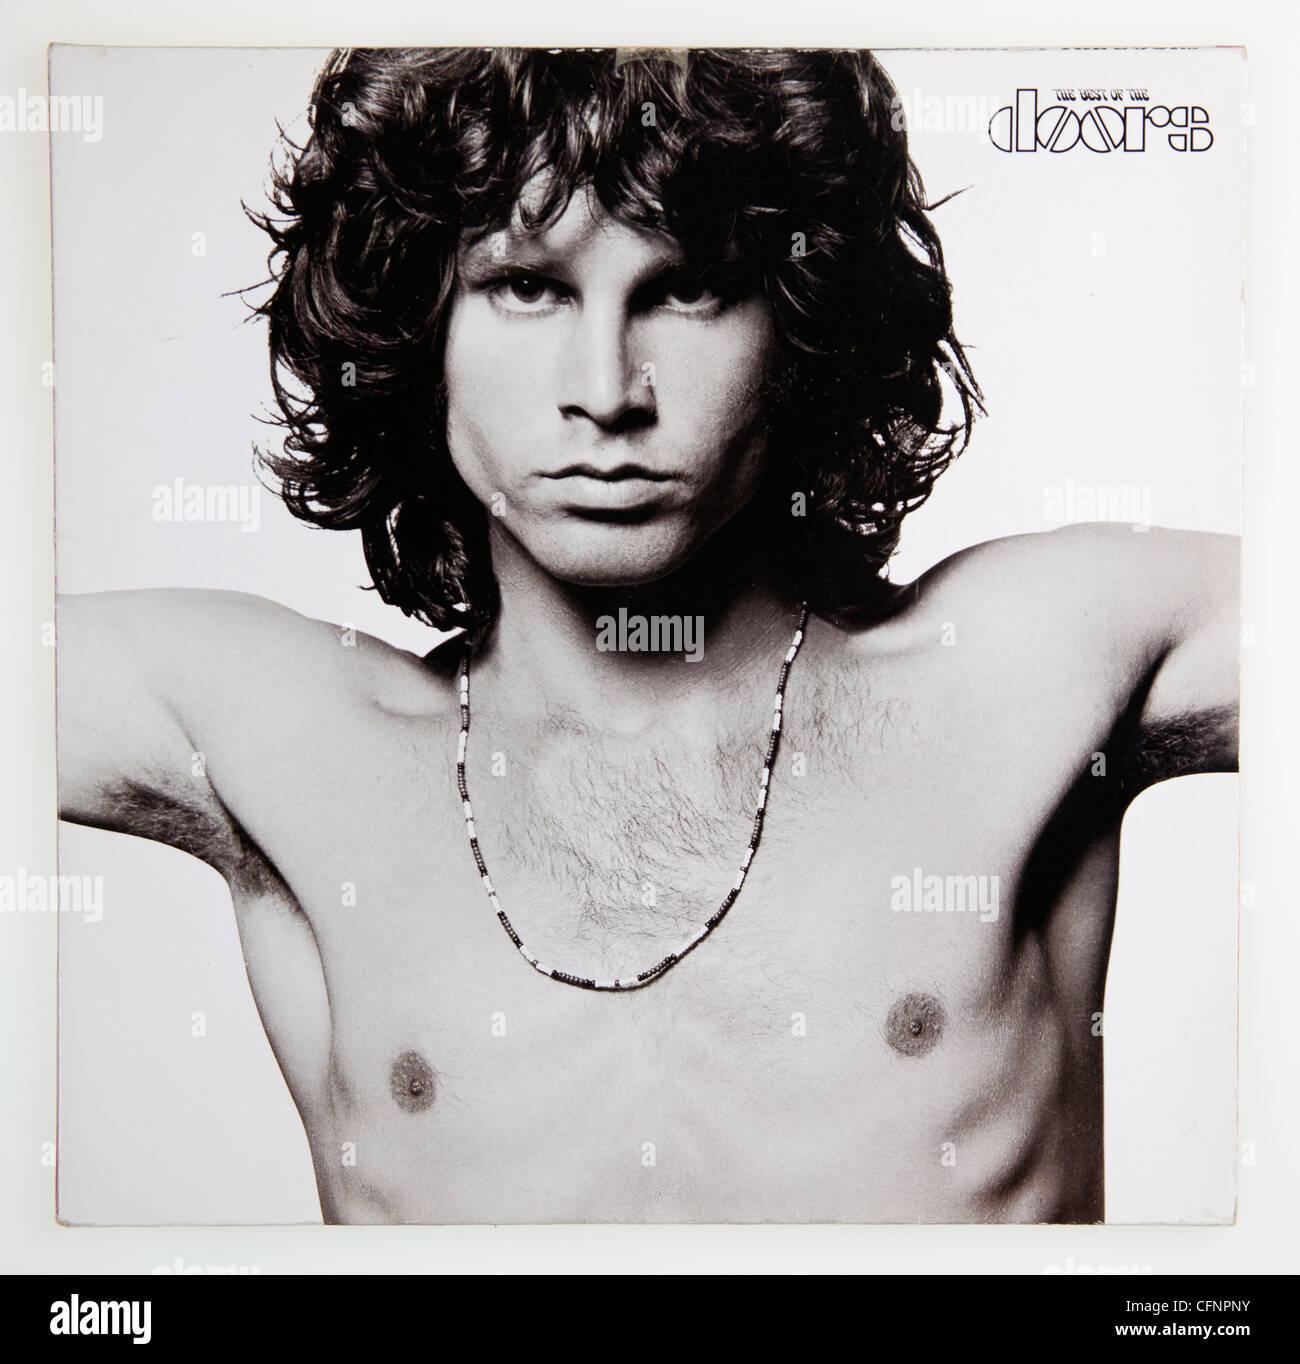 The Best of The Doors album cover  sc 1 st  Alamy & The Best of The Doors album cover Stock Photo: 44119431 - Alamy